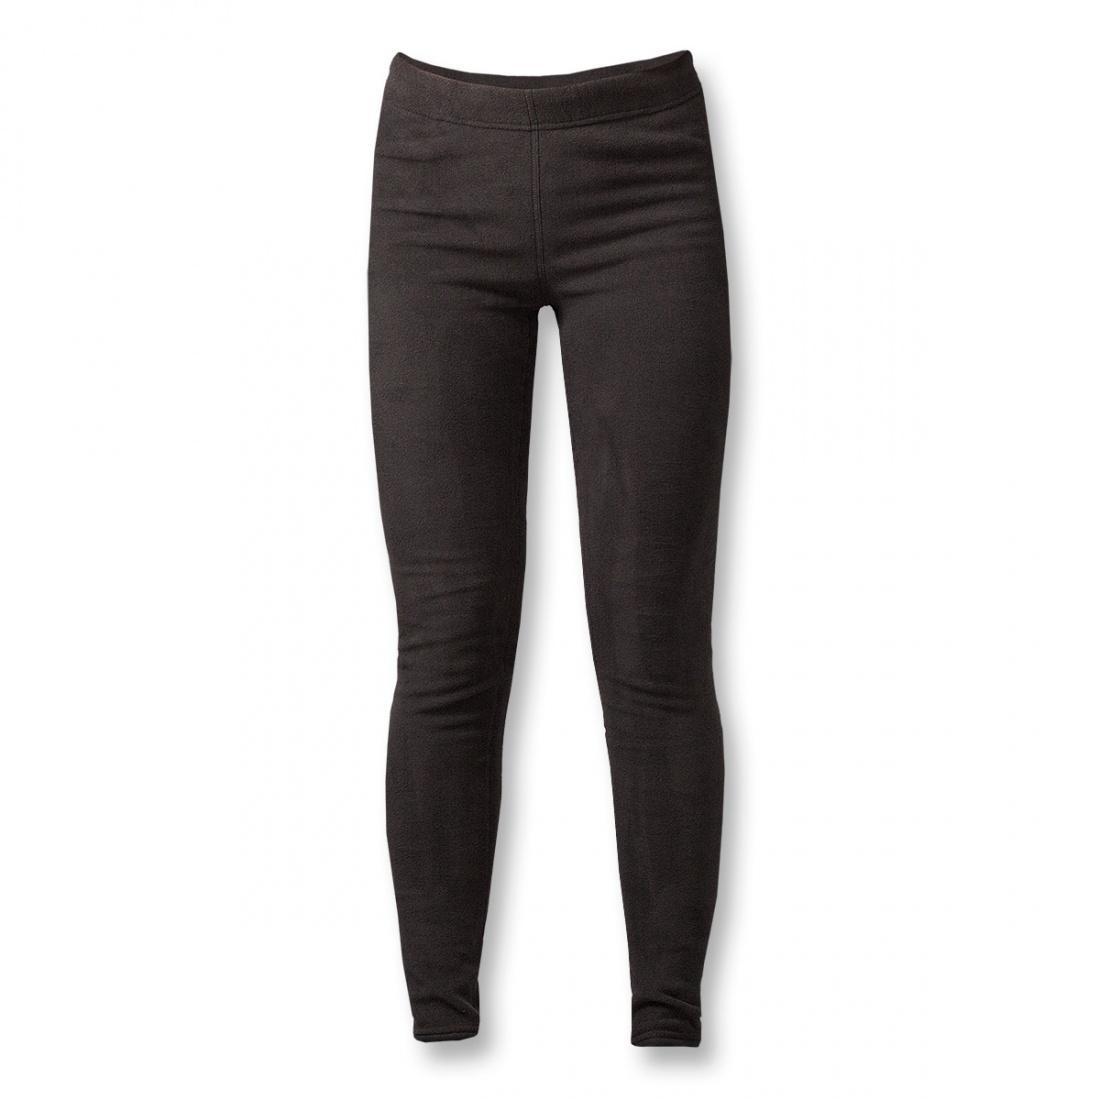 Термобелье брюки Penguin 100 Micro ЖенскиеБрюки<br><br><br>Цвет: Черный<br>Размер: 44